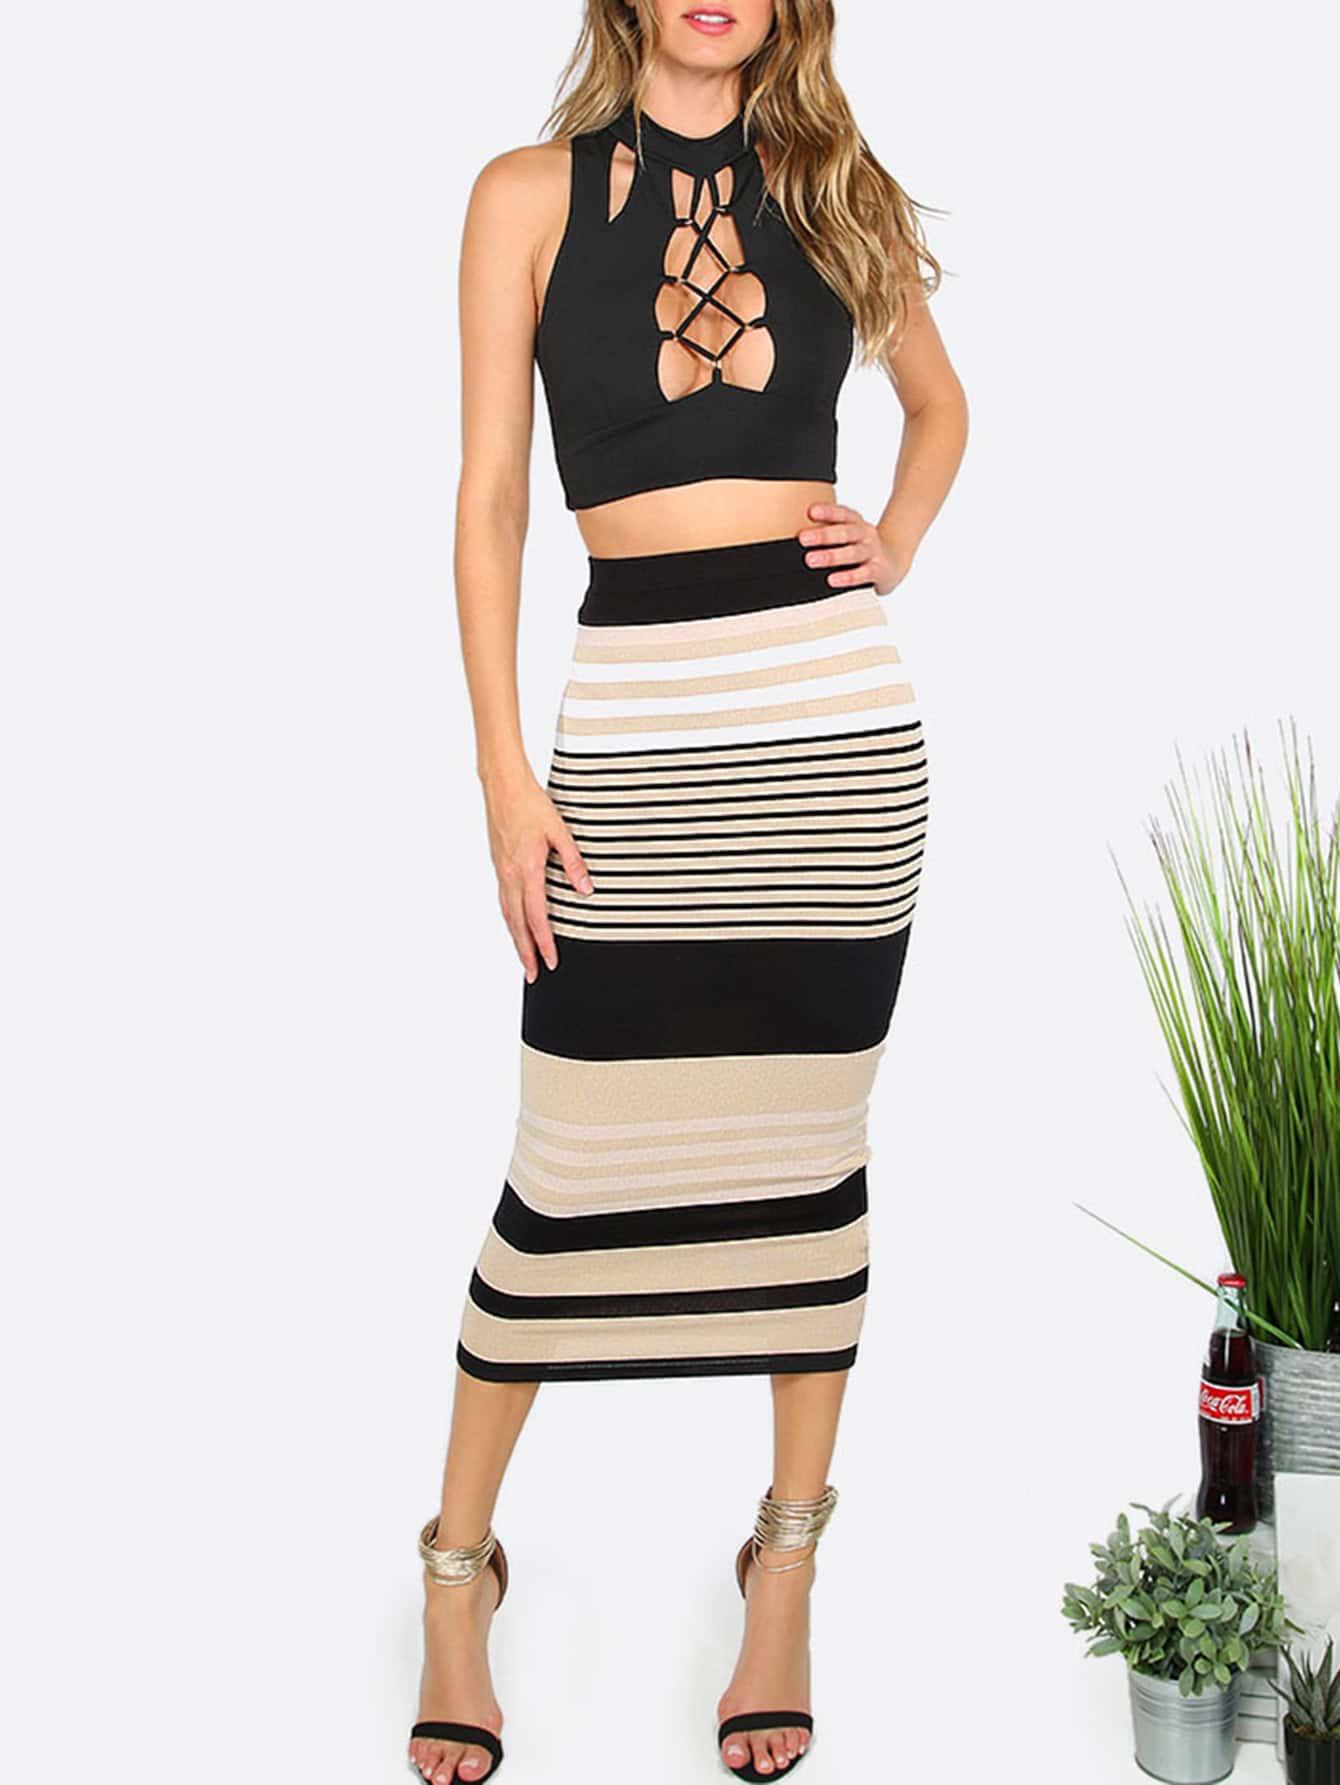 Manufacturer turkey jones Boat Neck Plain Back Hole Maxi Dress for women size chart